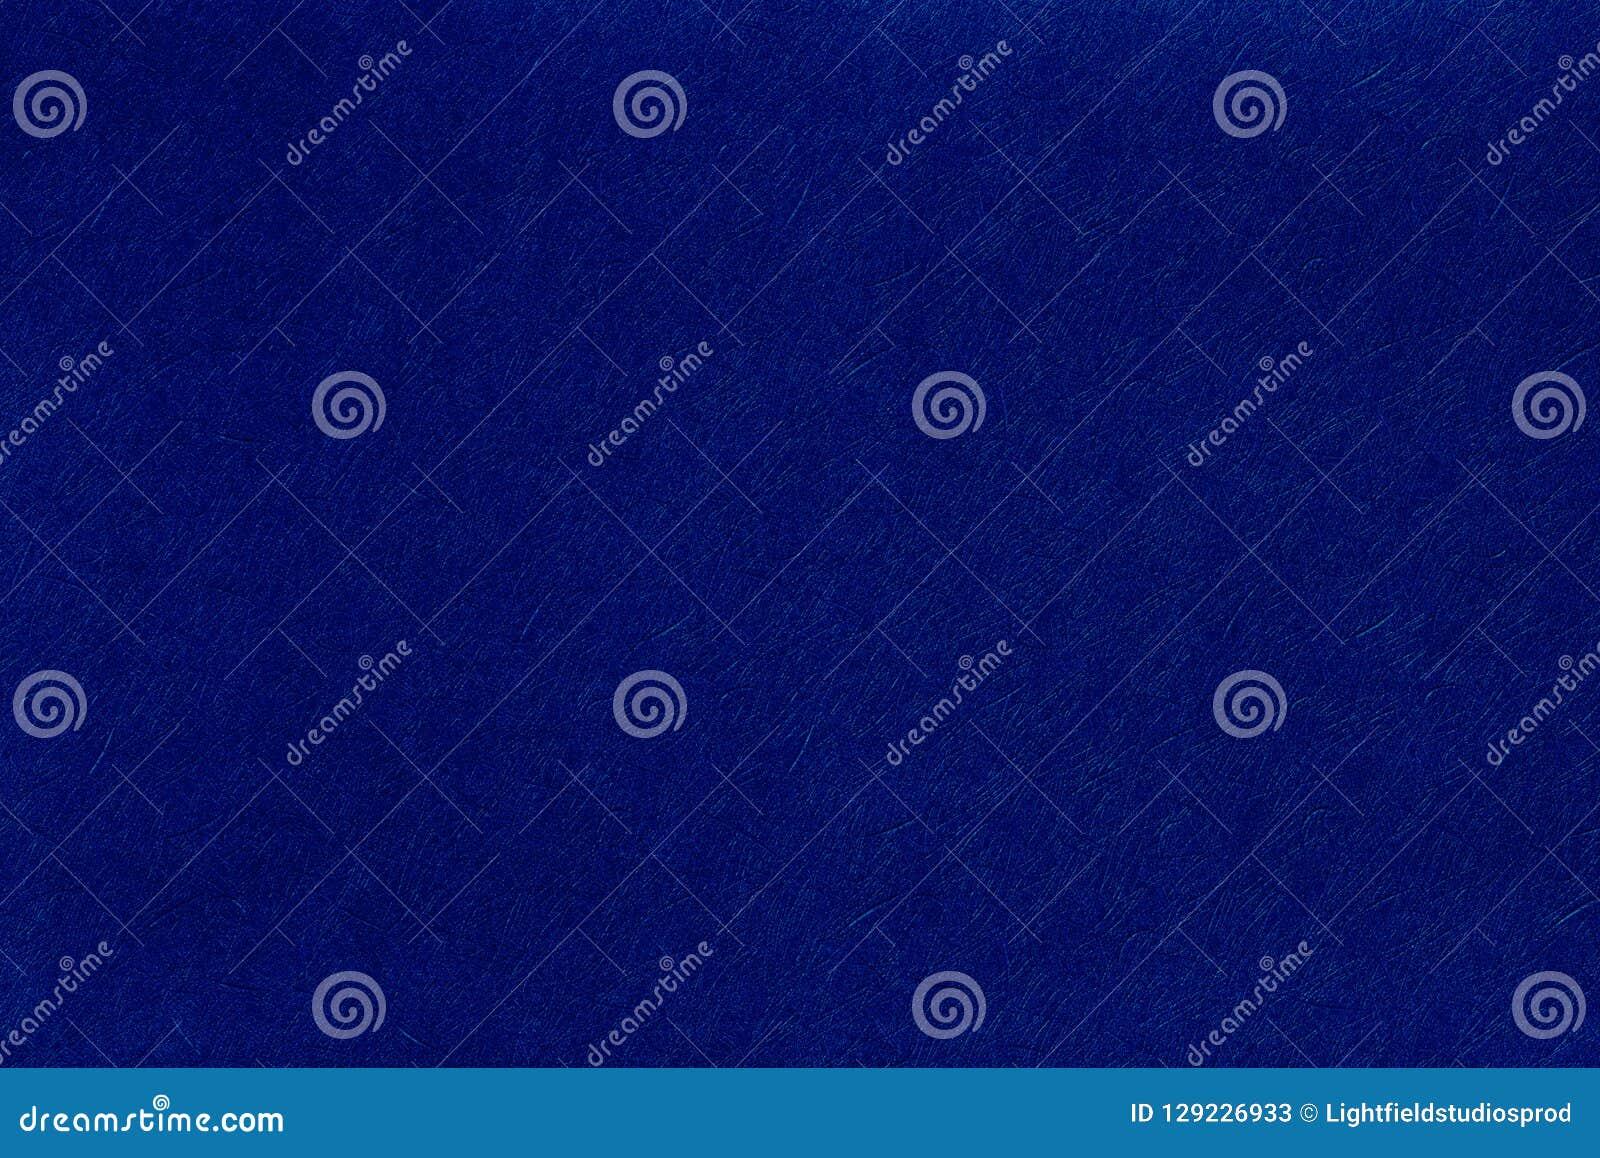 Design Of Dark Blue Wallpaper Texture As Stock Image Image